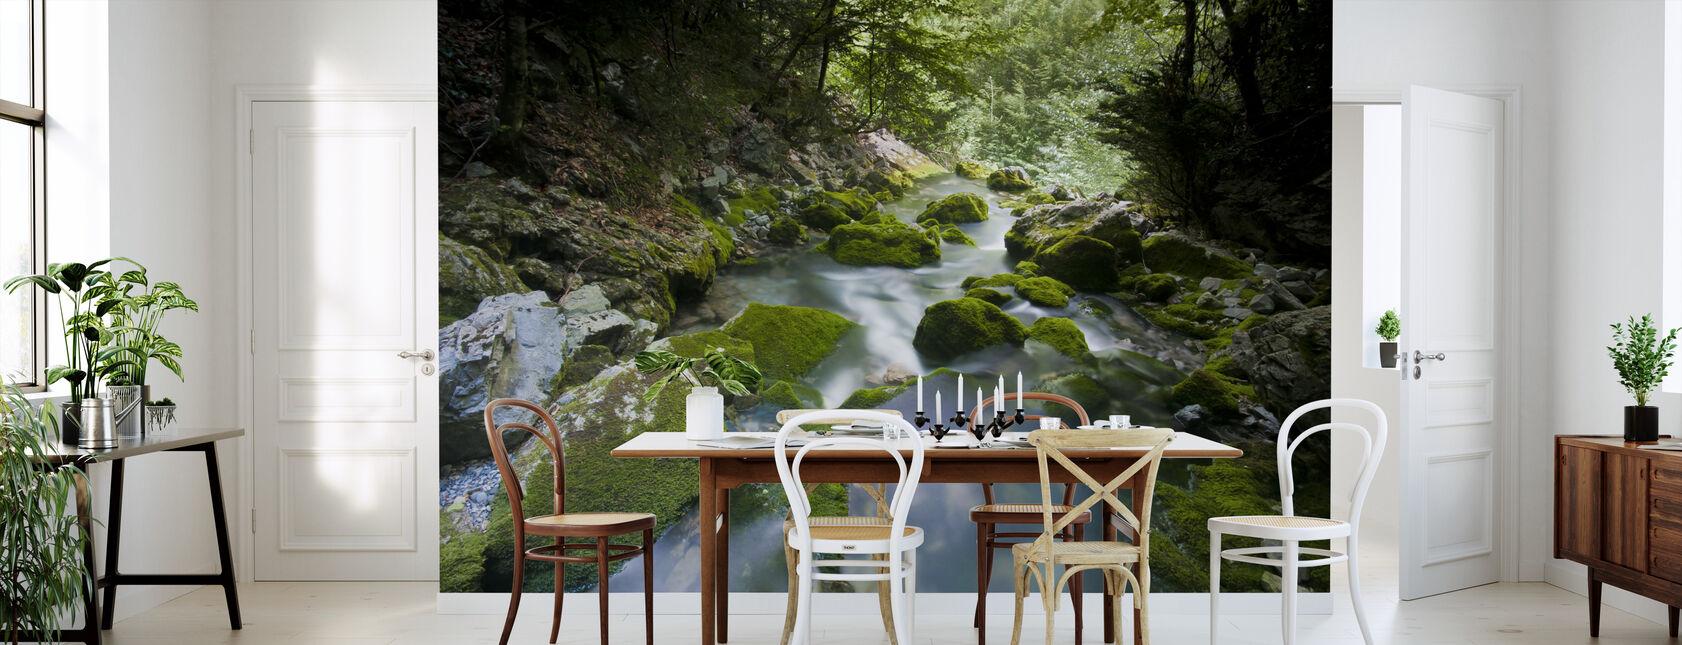 Secret Gleaming Stream - Wallpaper - Kitchen